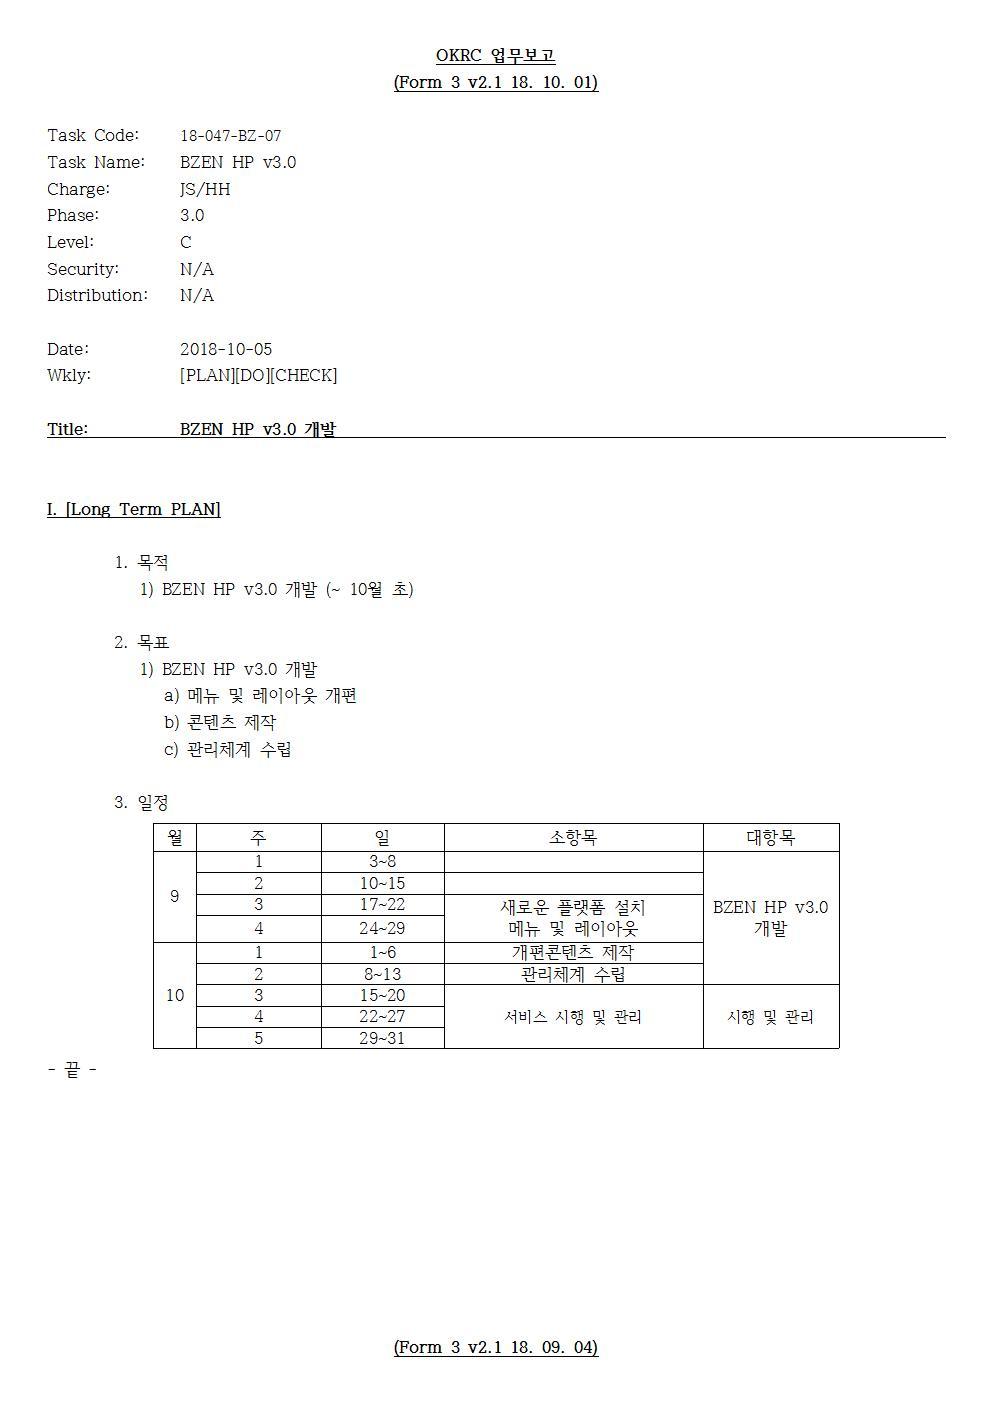 D-[18-047-BZ-07]-[BZEN HP v3.0]-[2018-10-05][HH]001.jpg